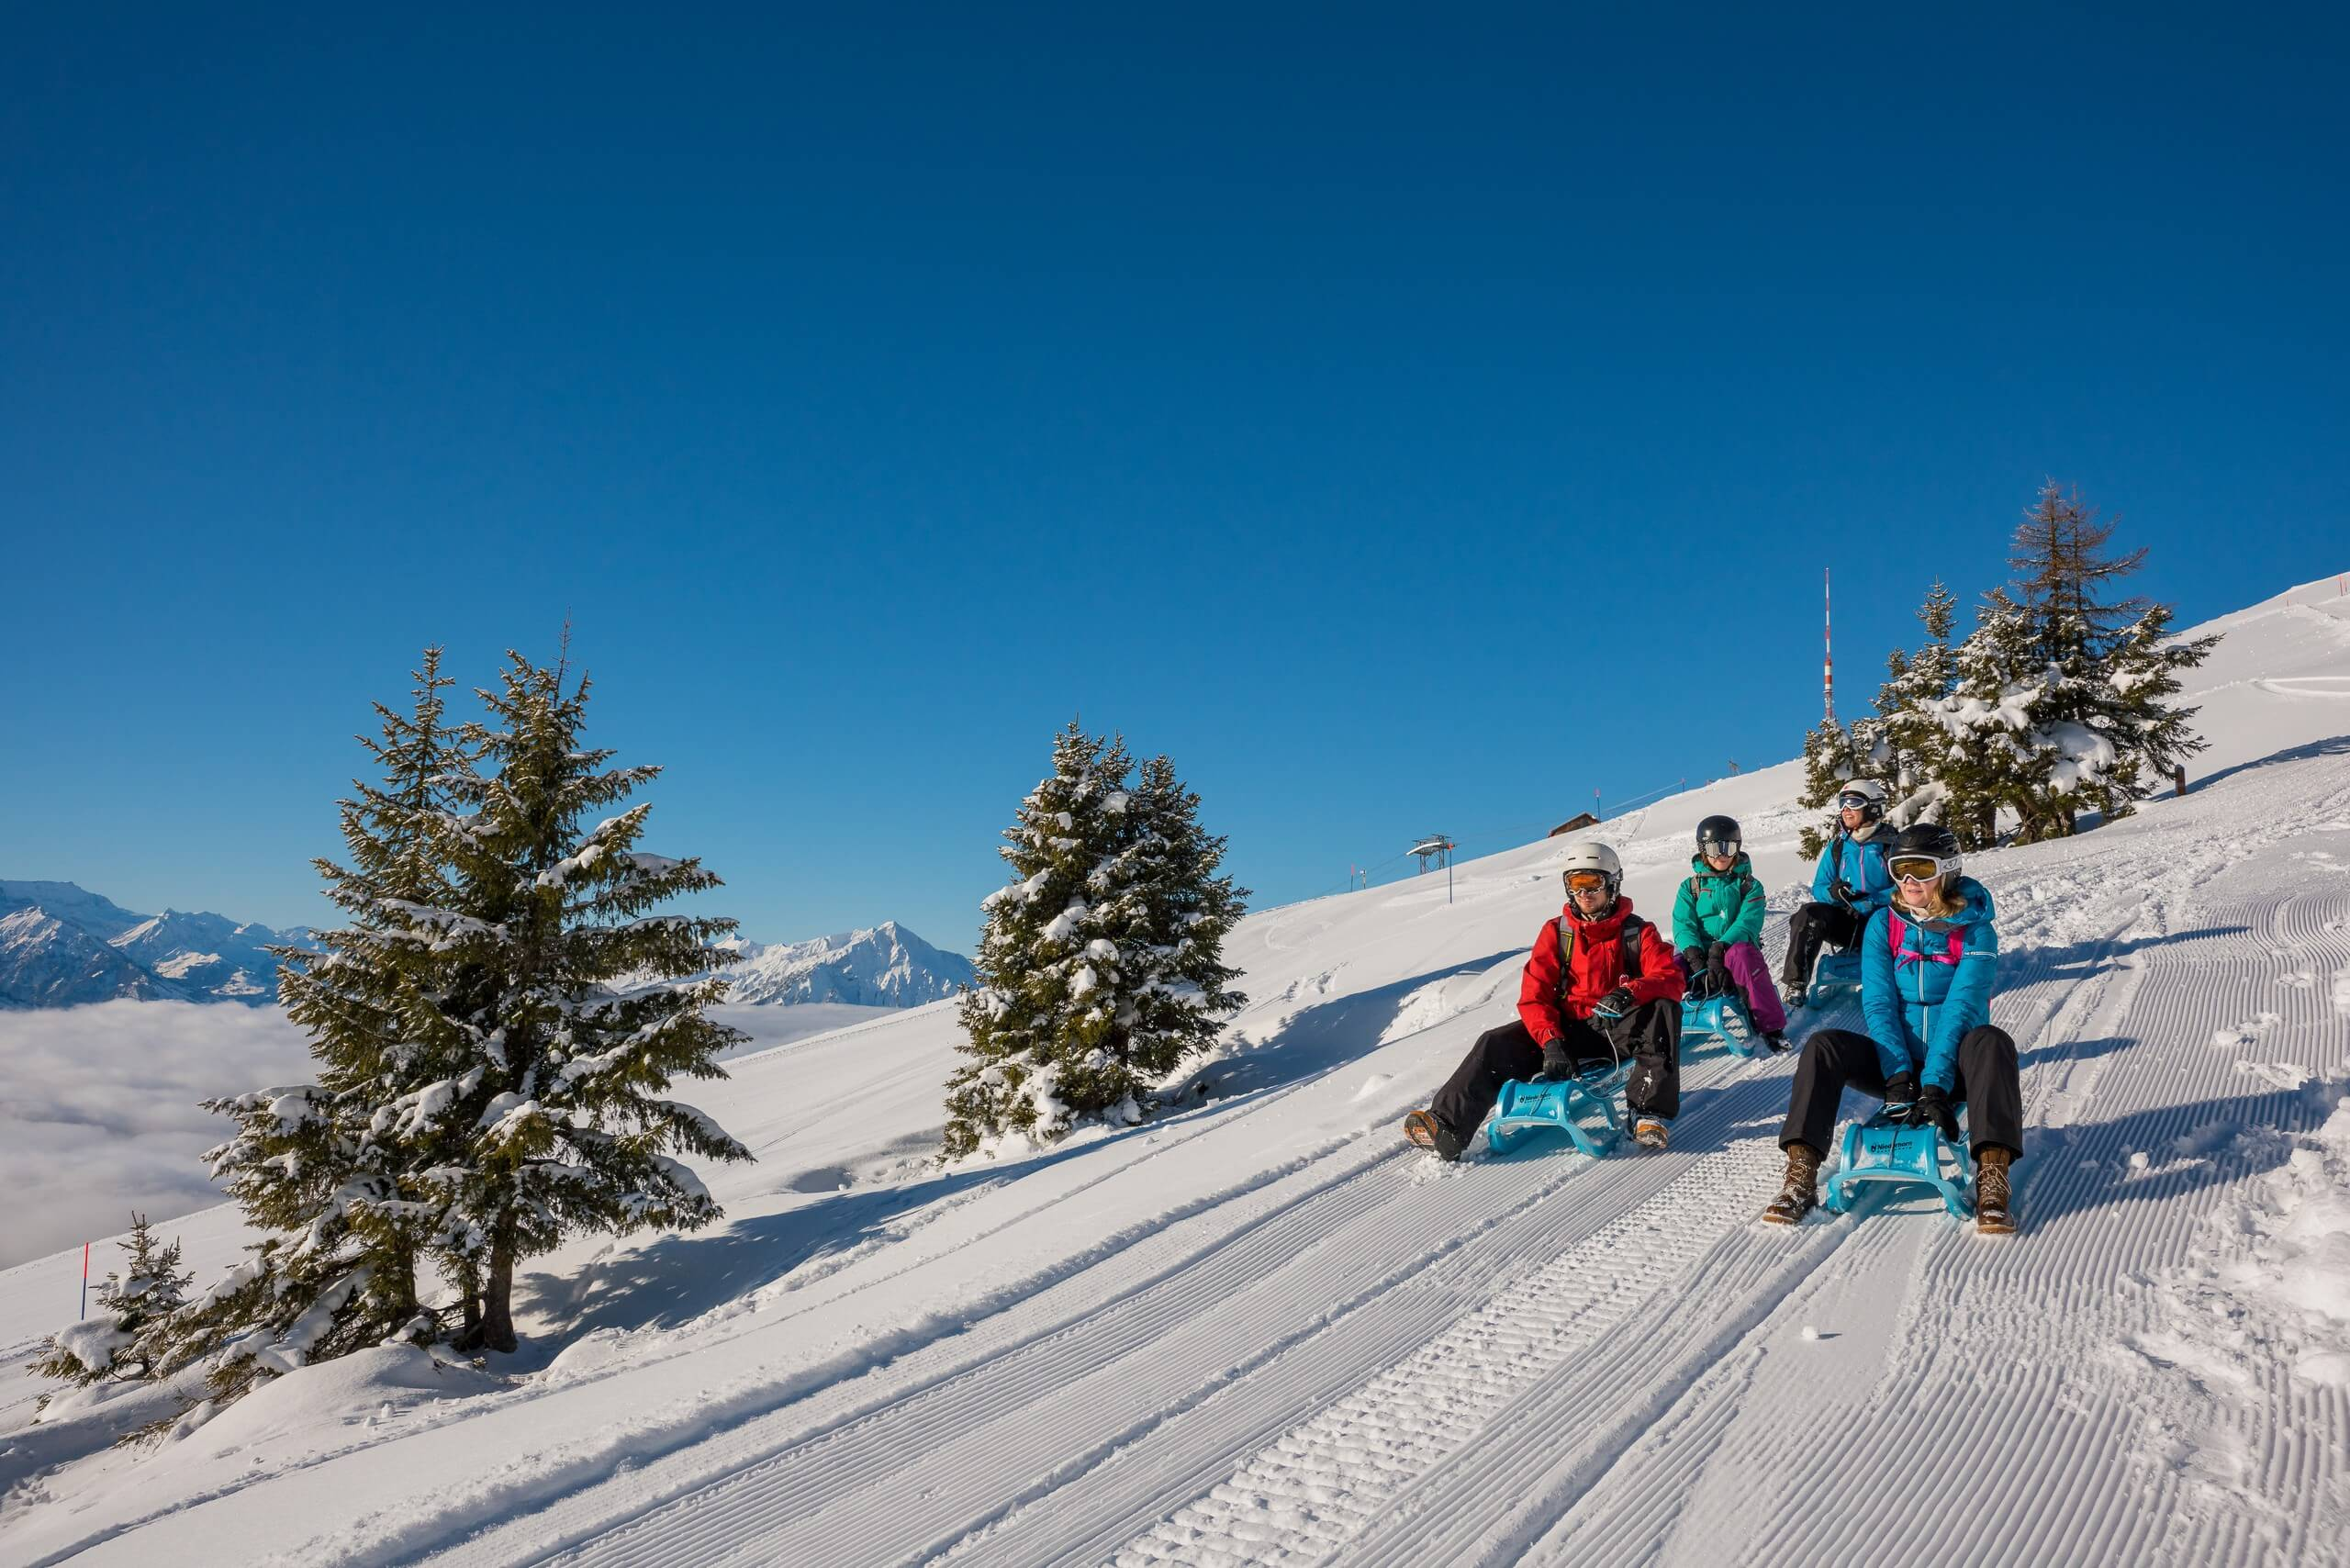 niederhorn-schlitteln-winter-nebelmeer-berge-piste-tannen-gruppe